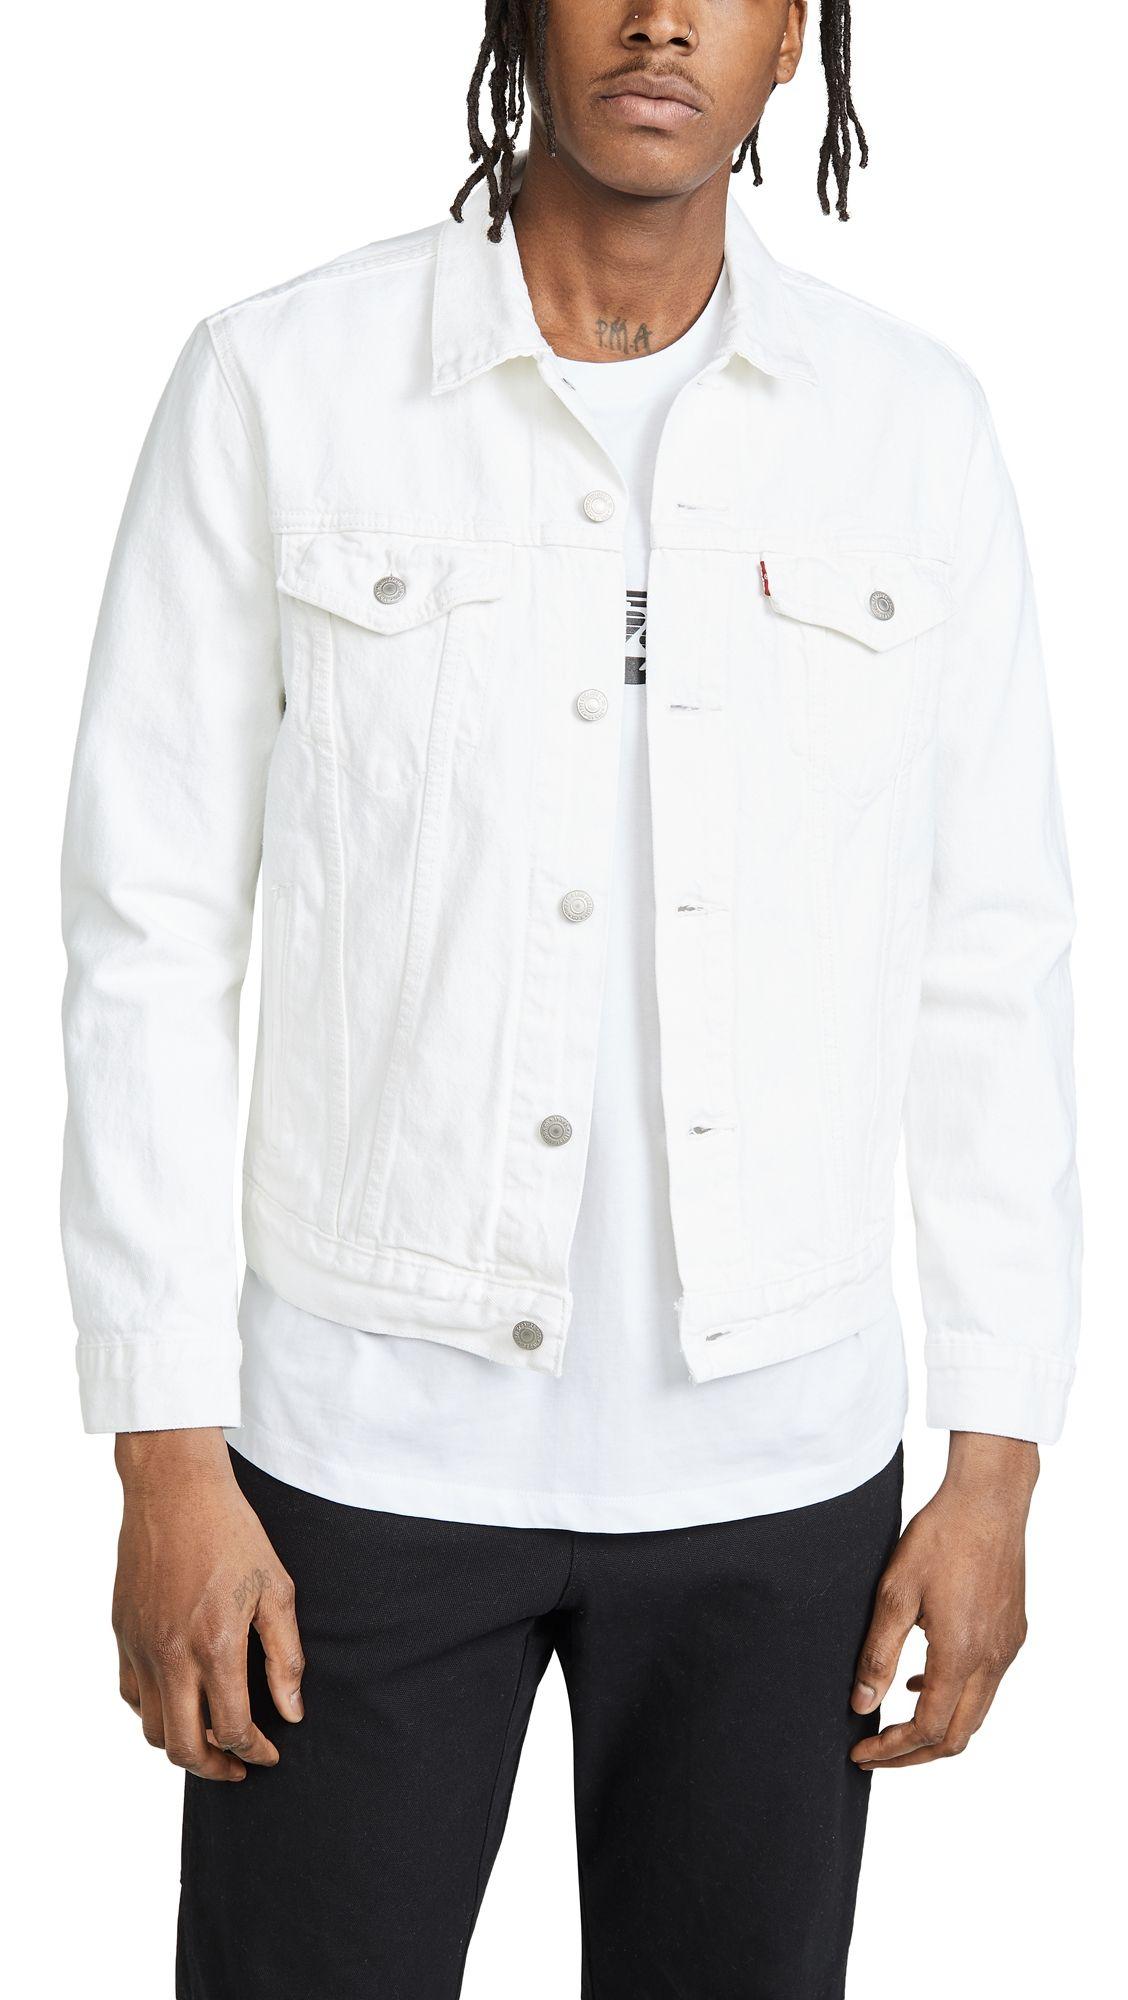 Levi S White Denim Jacket Levis Cloth White Denim Jacket White Denim Jacket Outfit Denim Jacket [ 2000 x 1128 Pixel ]